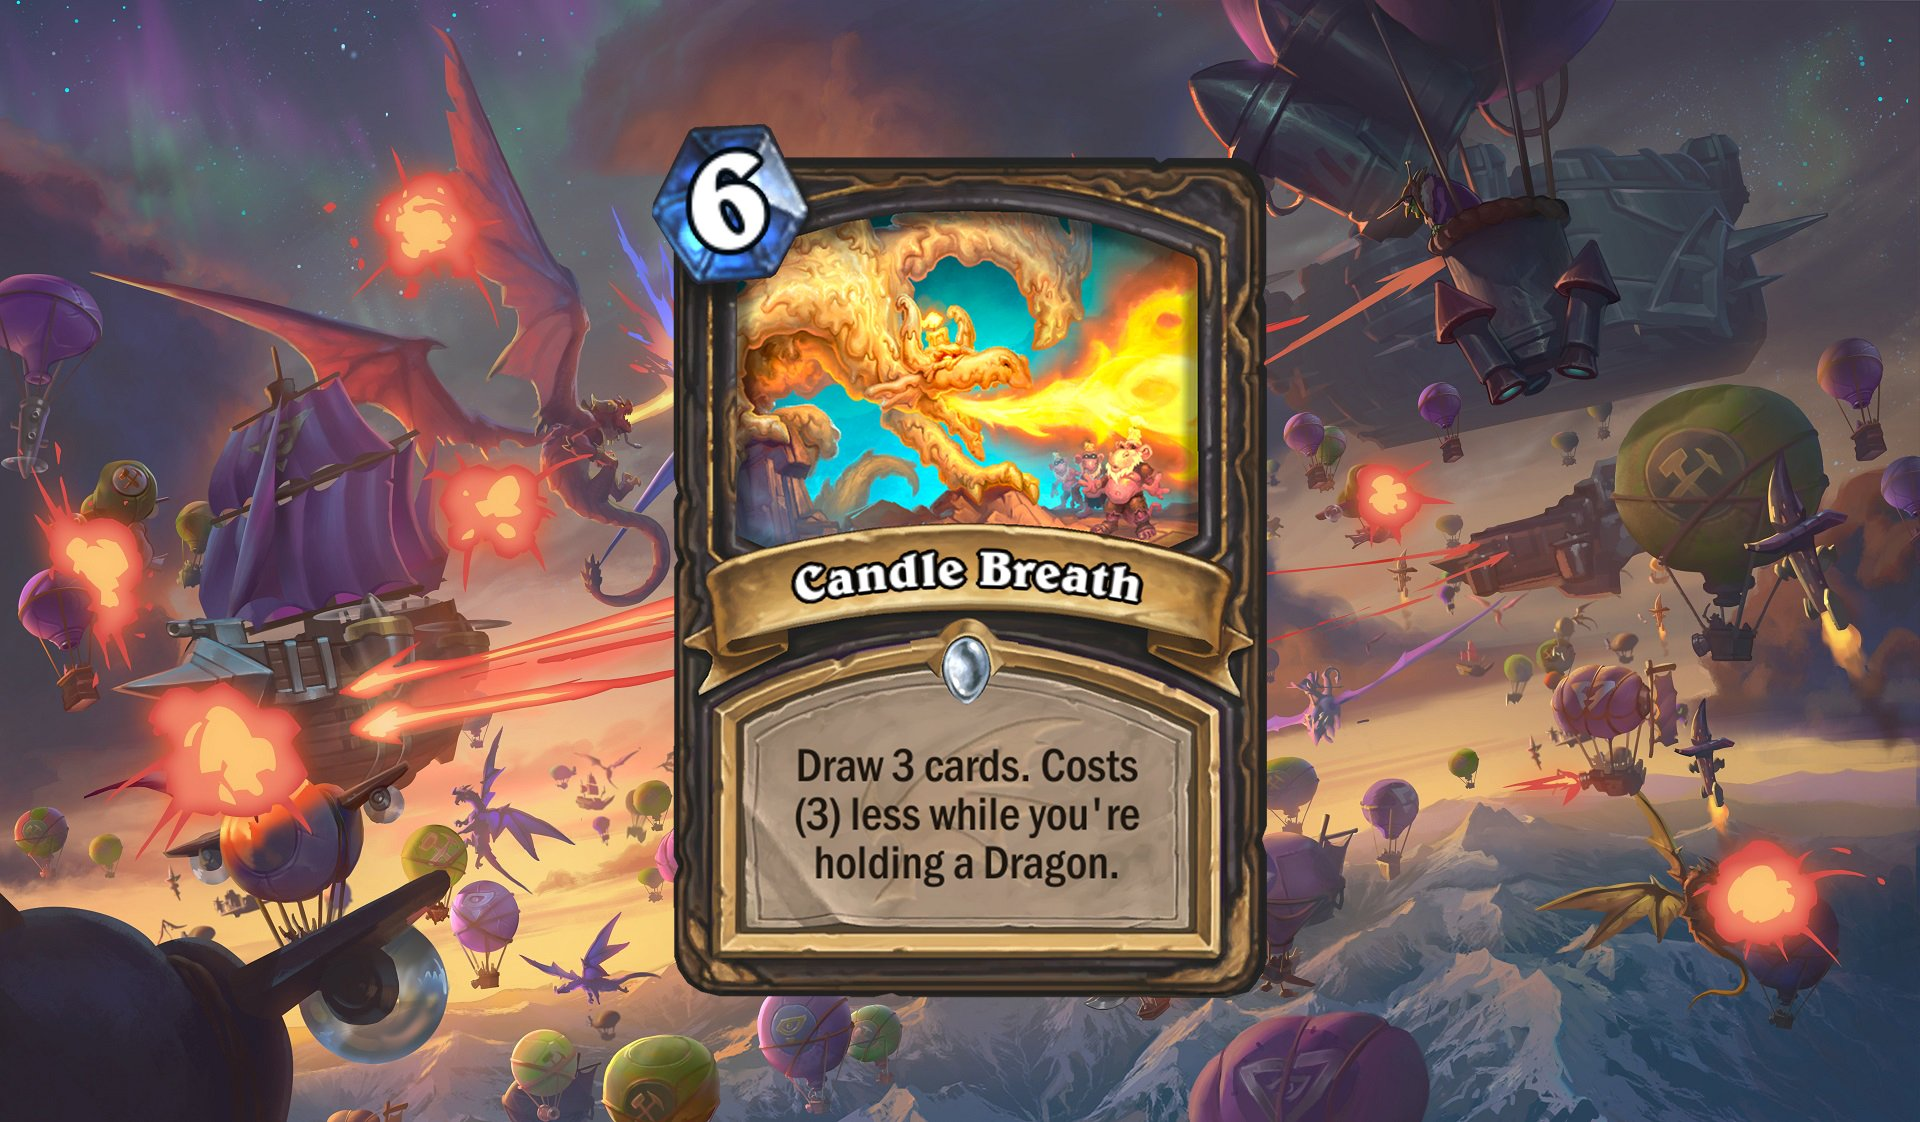 Hearthstone - Candle Breath